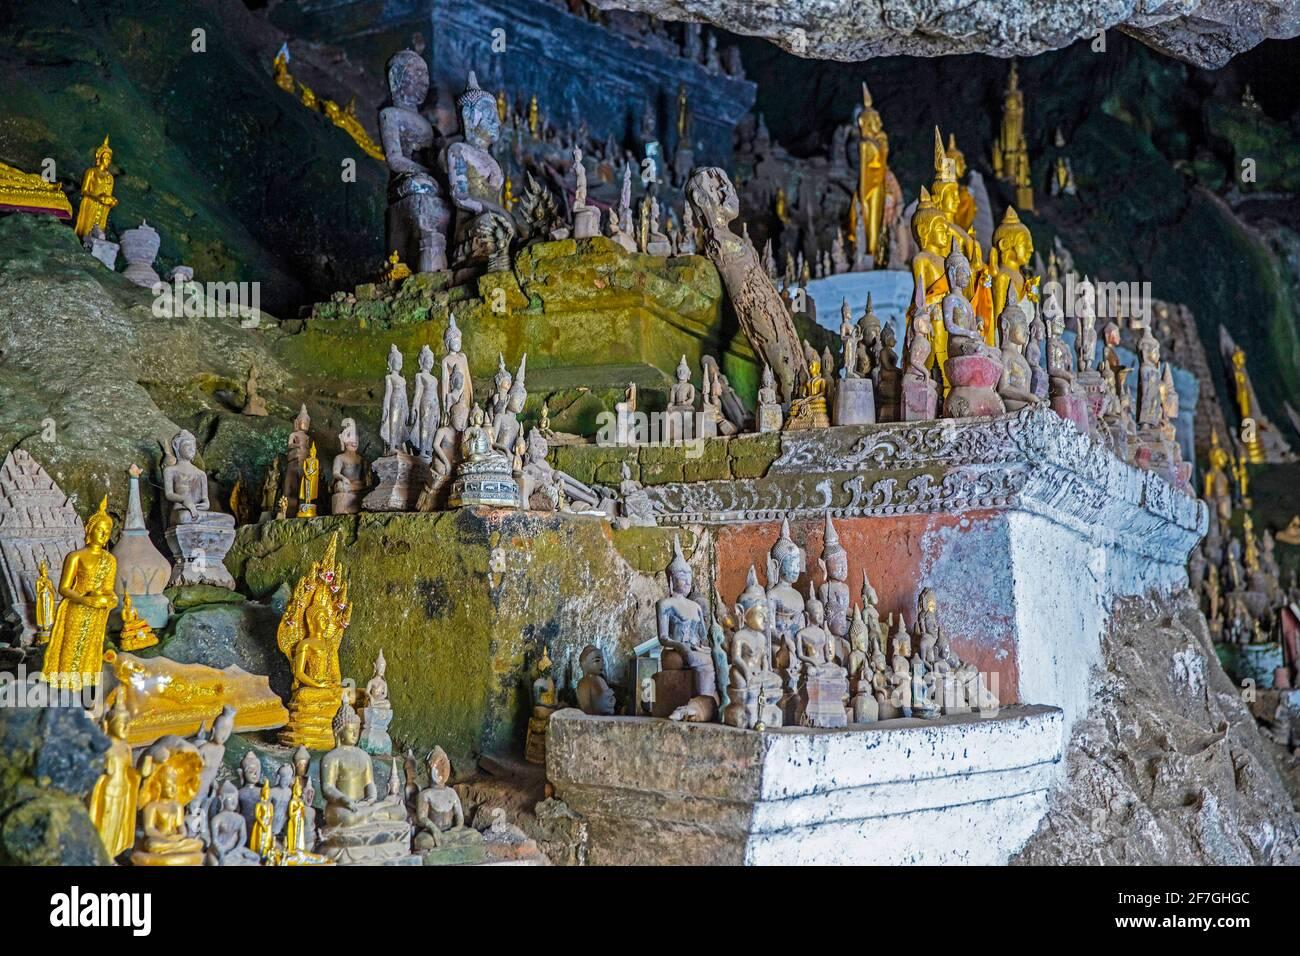 Statue di Buddha all'interno della grotta inferiore / Tham Ting alle Grotte di Pak ou lungo il fiume Mekong vicino a Luang Phabang / Luang Prabang, Laos Foto Stock